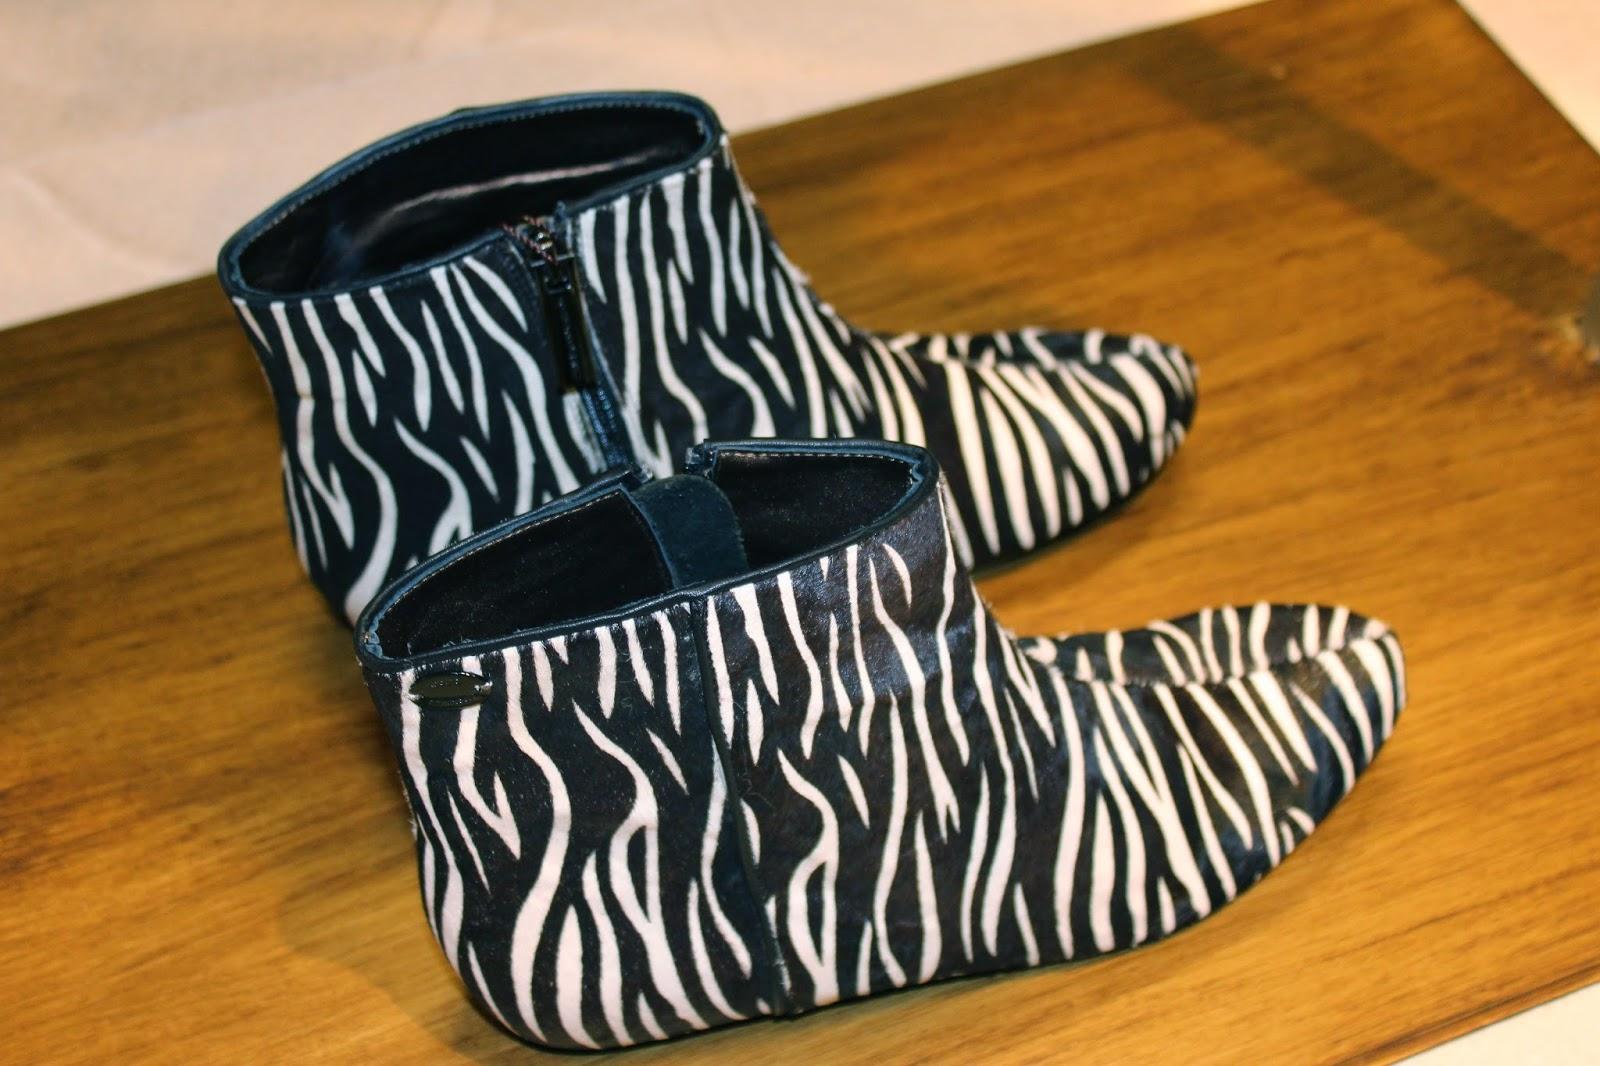 botines estampado cebra